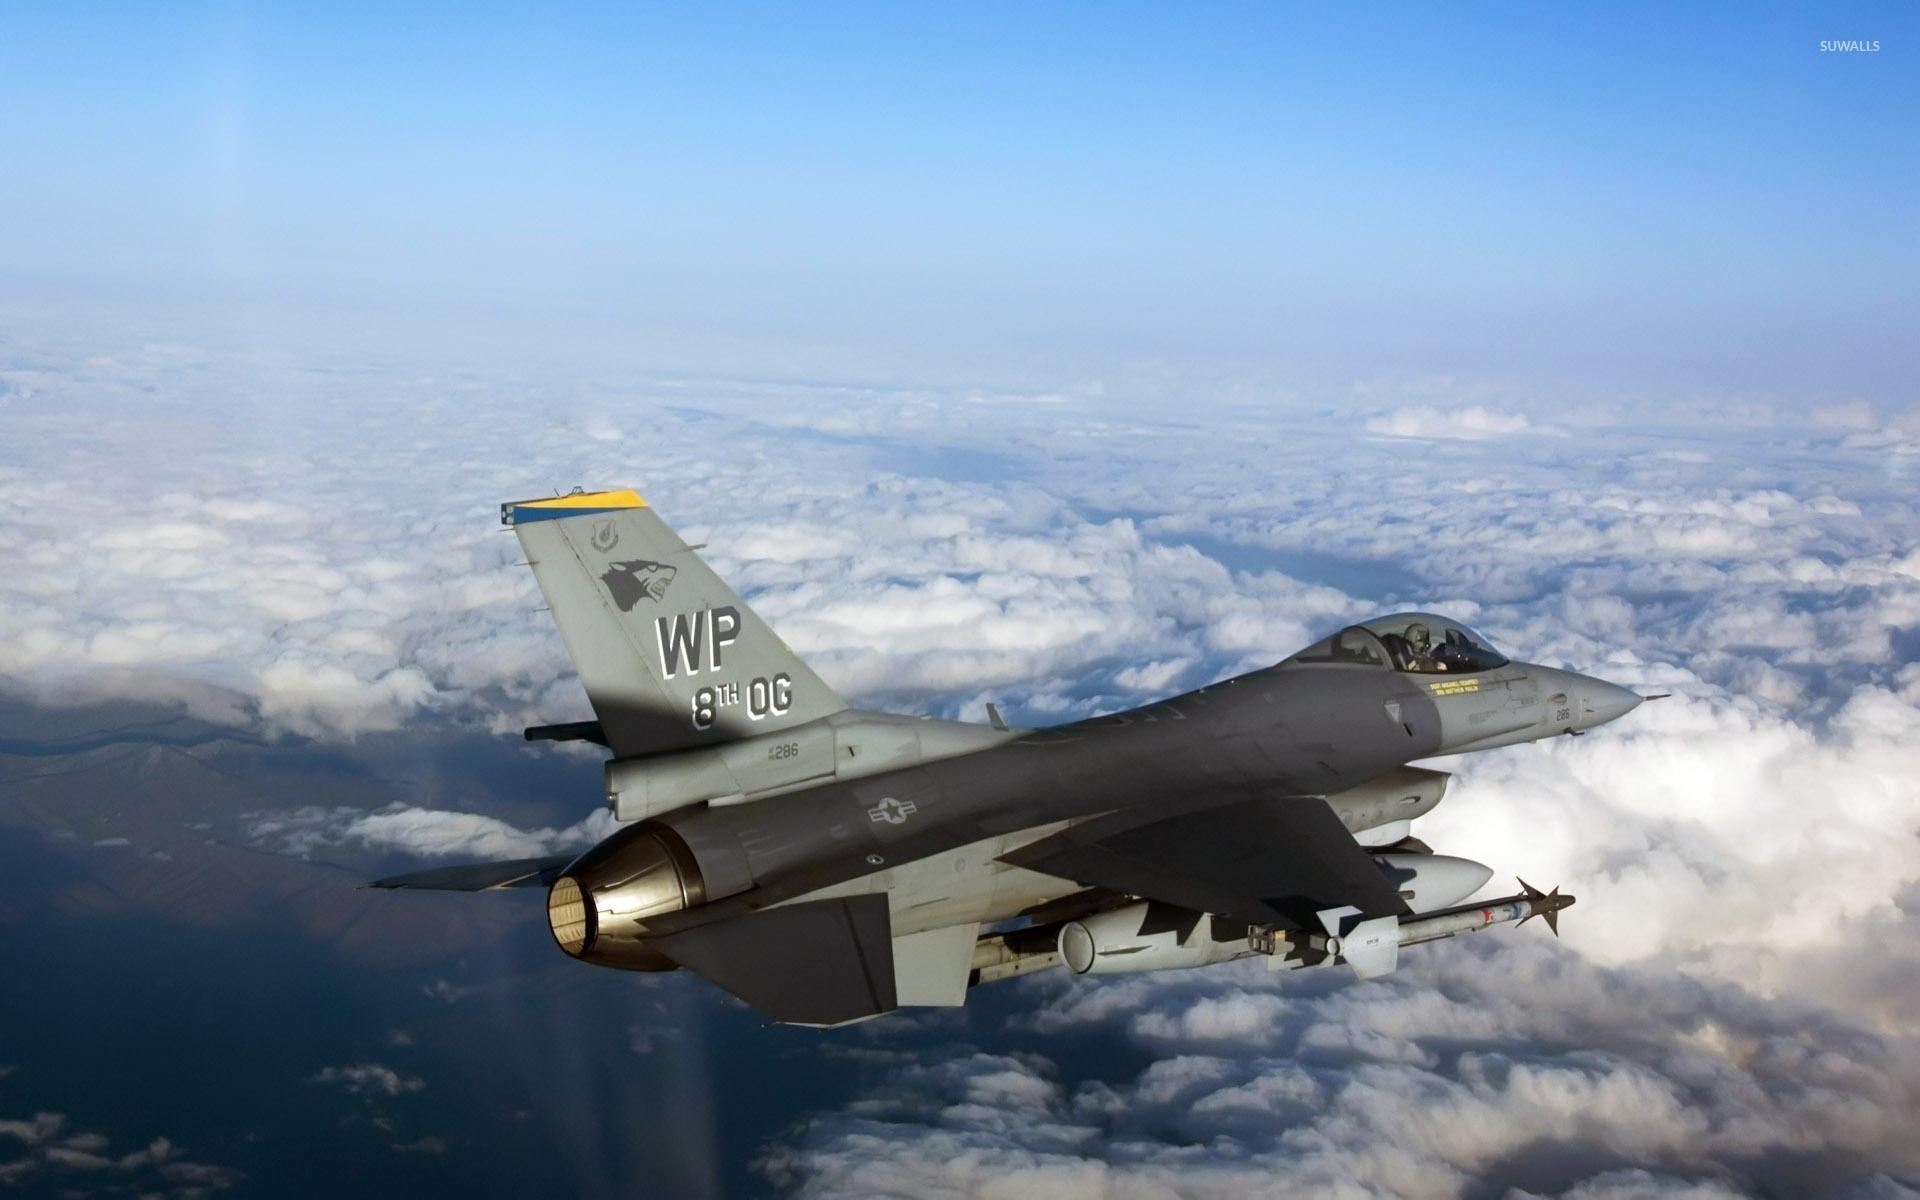 General Dynamics F-16 Fighting Falcon [14] Wallpaper